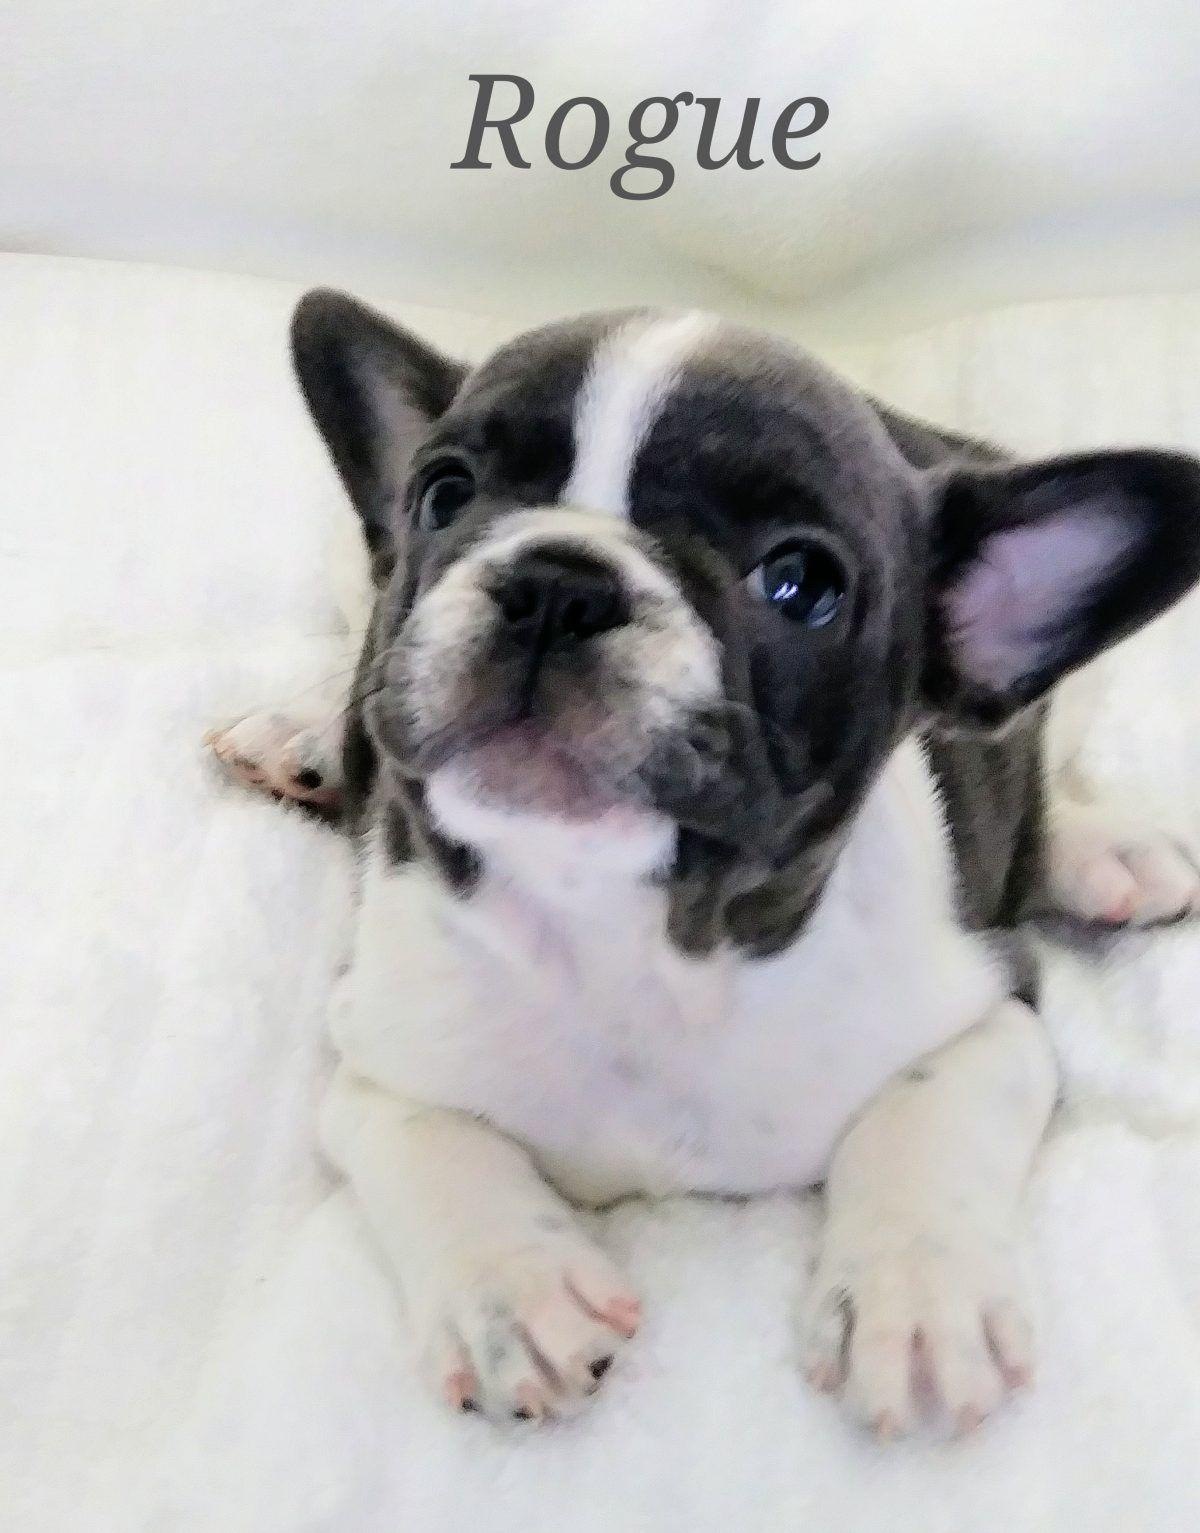 Rogue a female AKC Piebald French Bulldog puppy born in